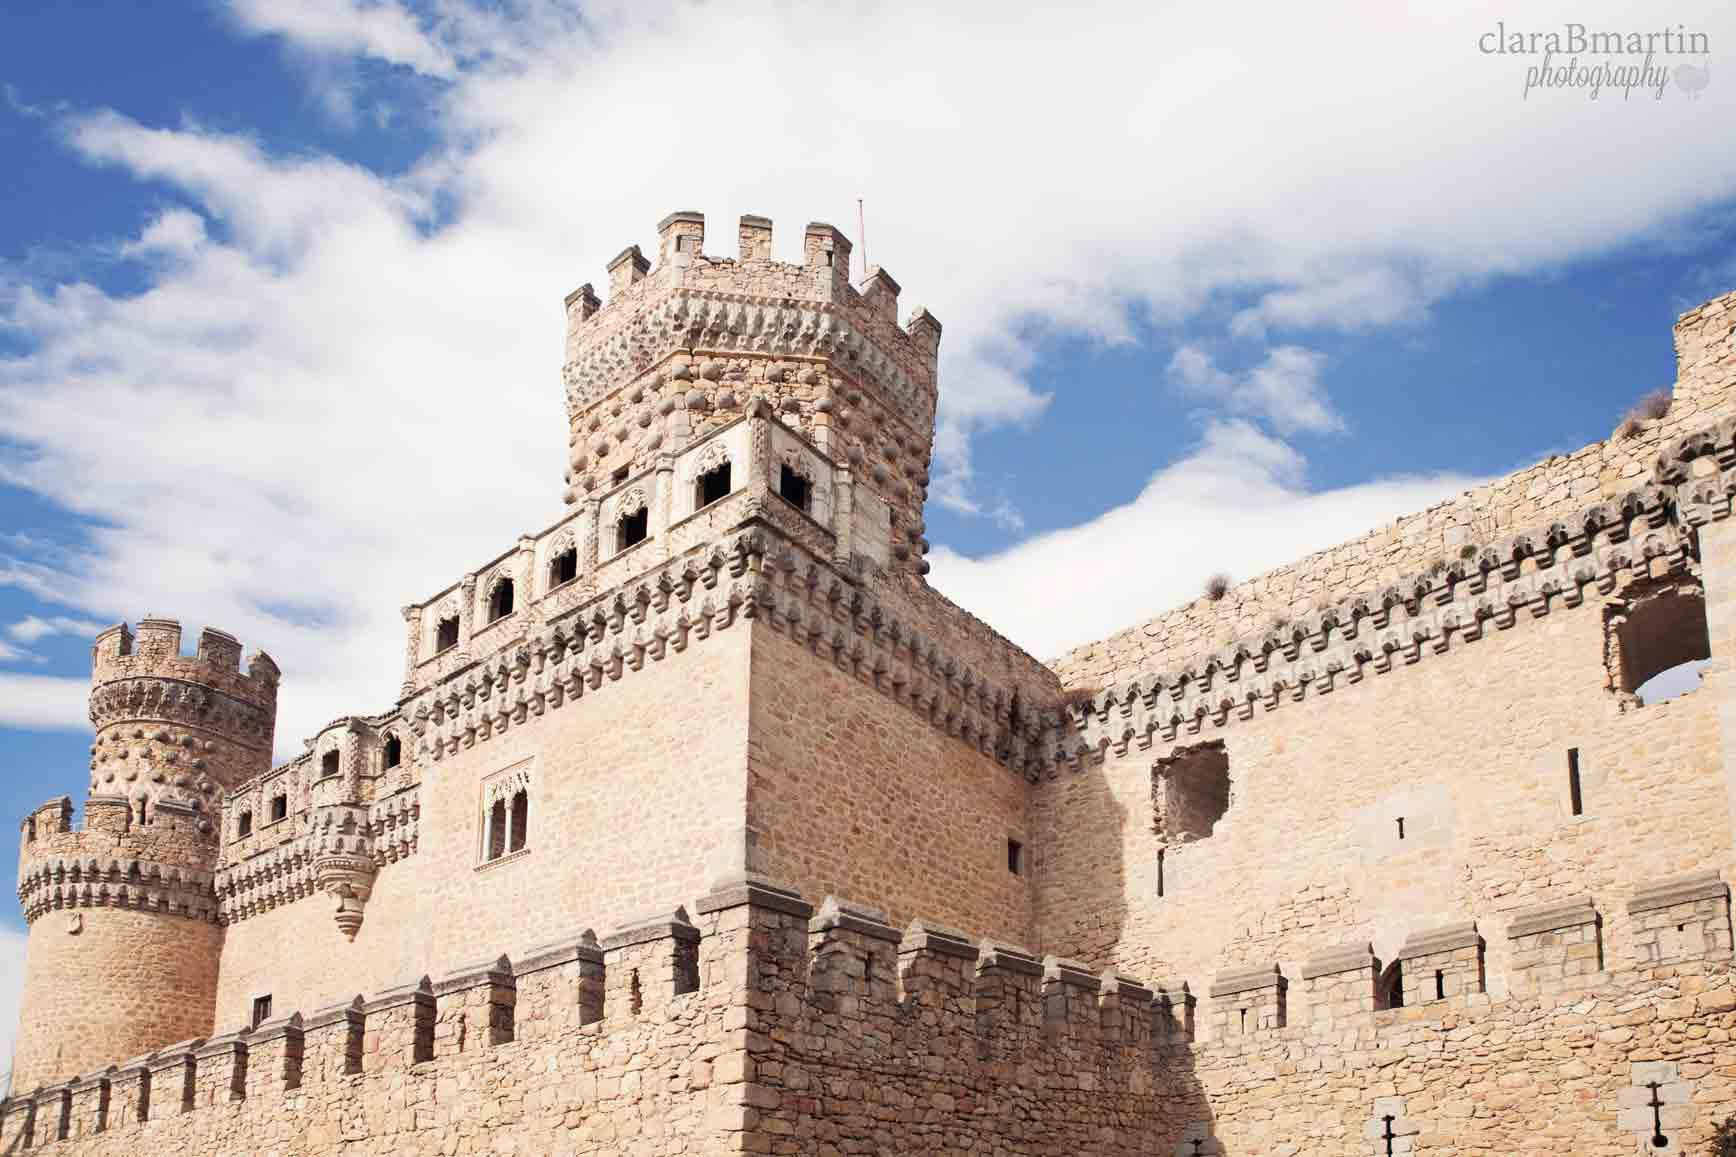 Castillo-Manzanares-El-Real-claraBmartin-01